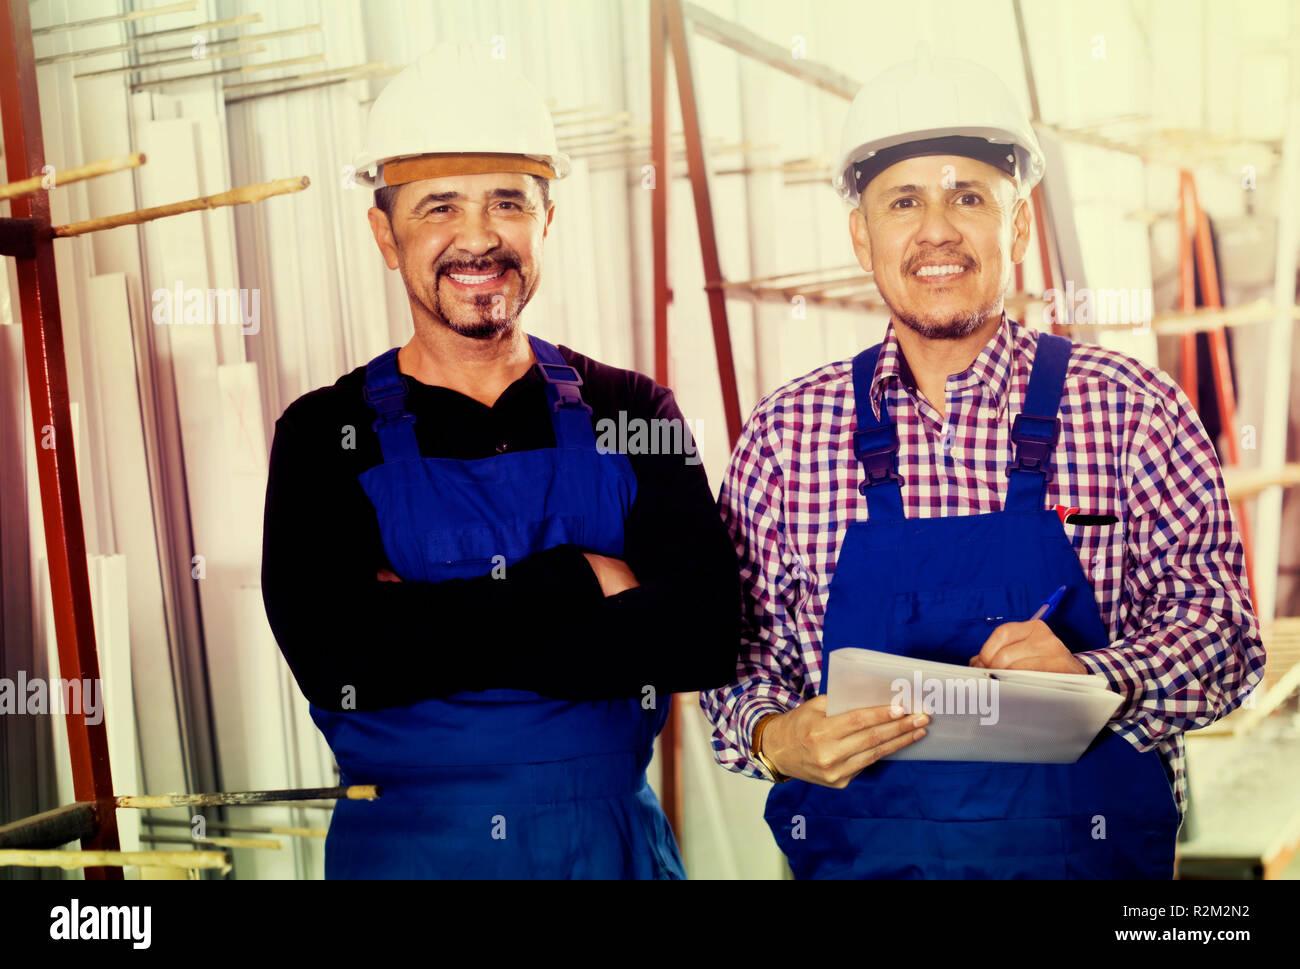 Positiven spanischen Maschinenbauer Überprüfung der Arbeit der Arbeit an modernen Fabrik Stockbild